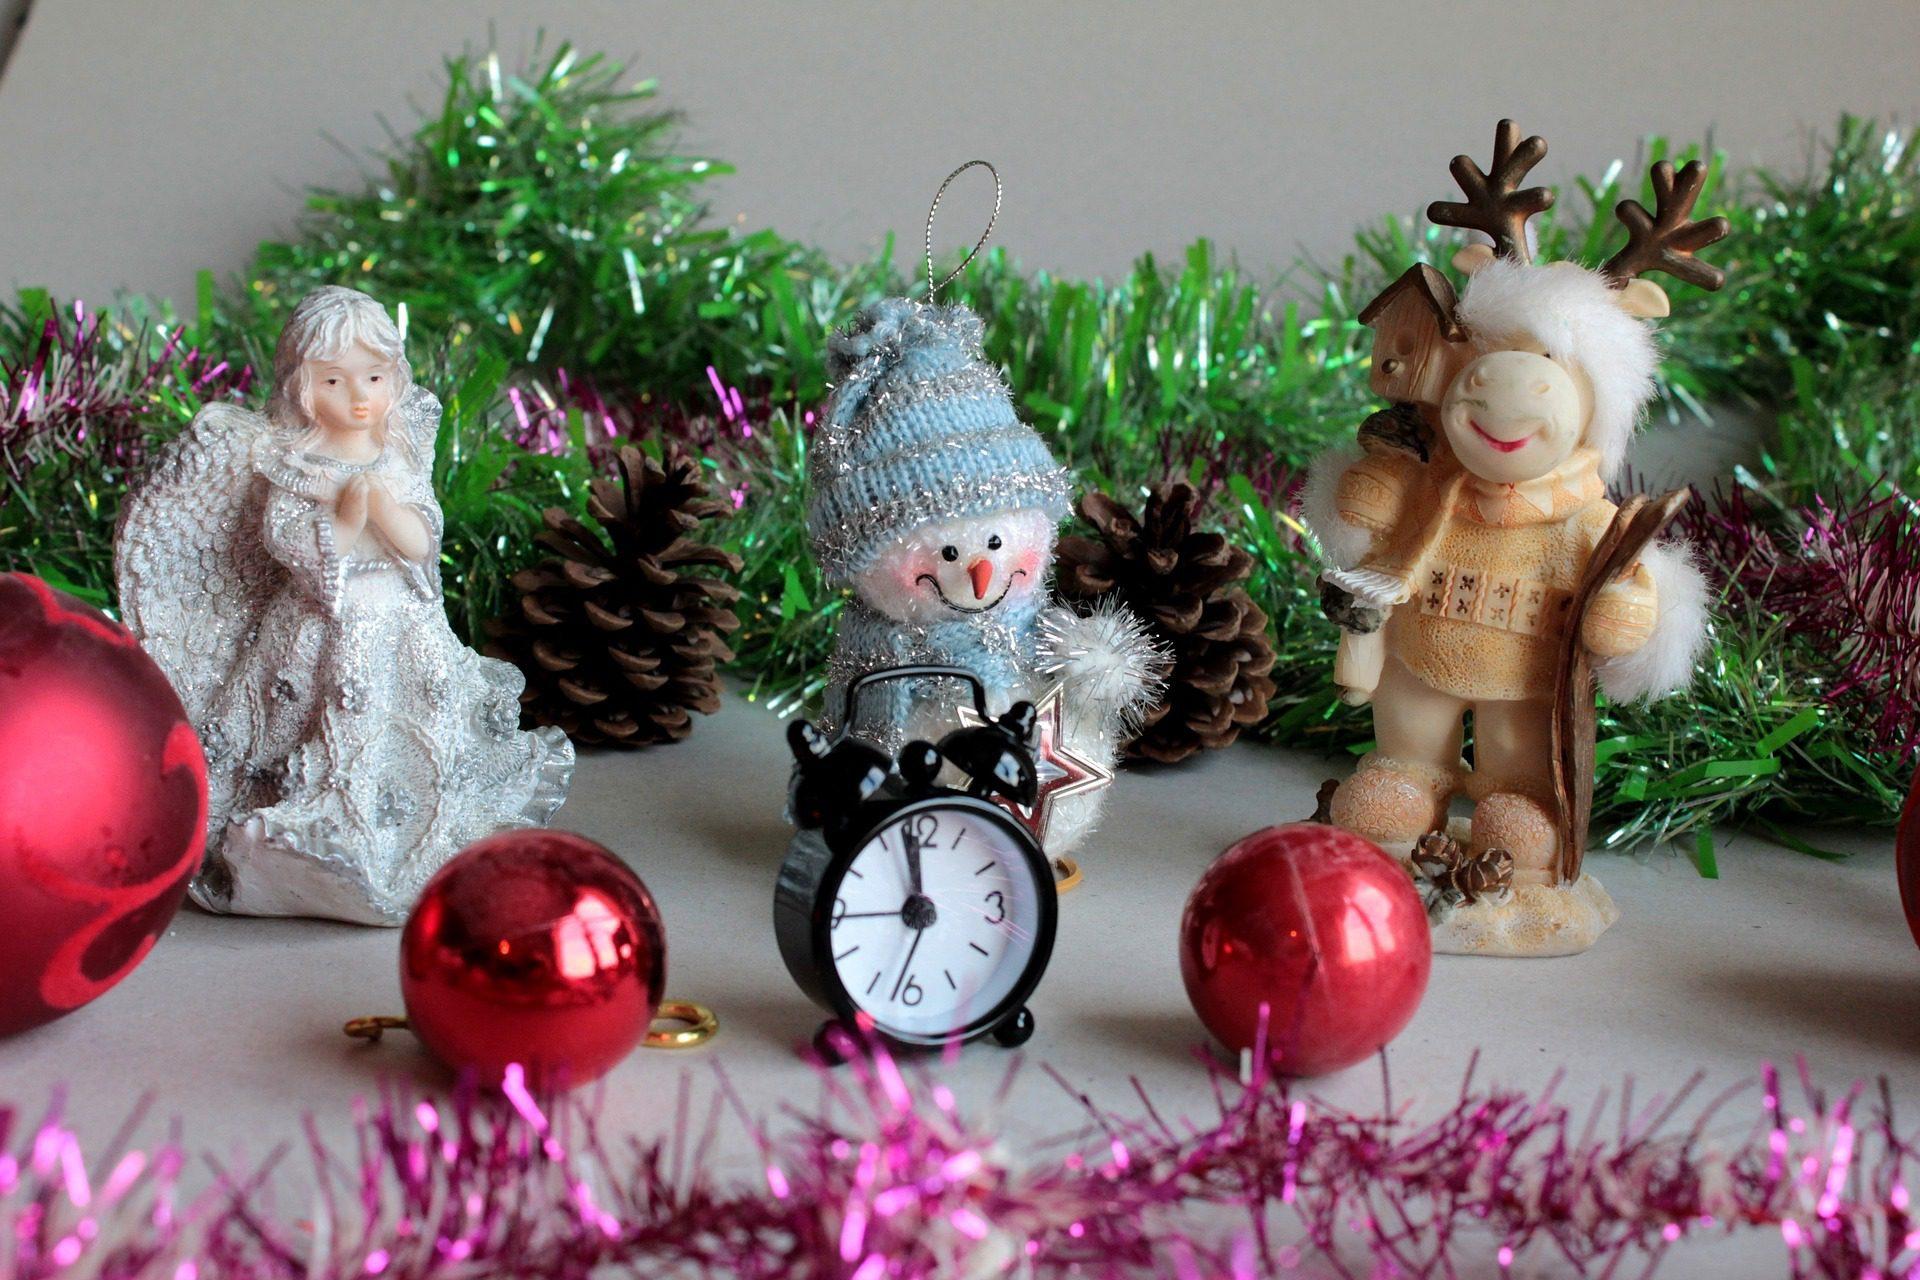 A September Christmas Countdown Checklist